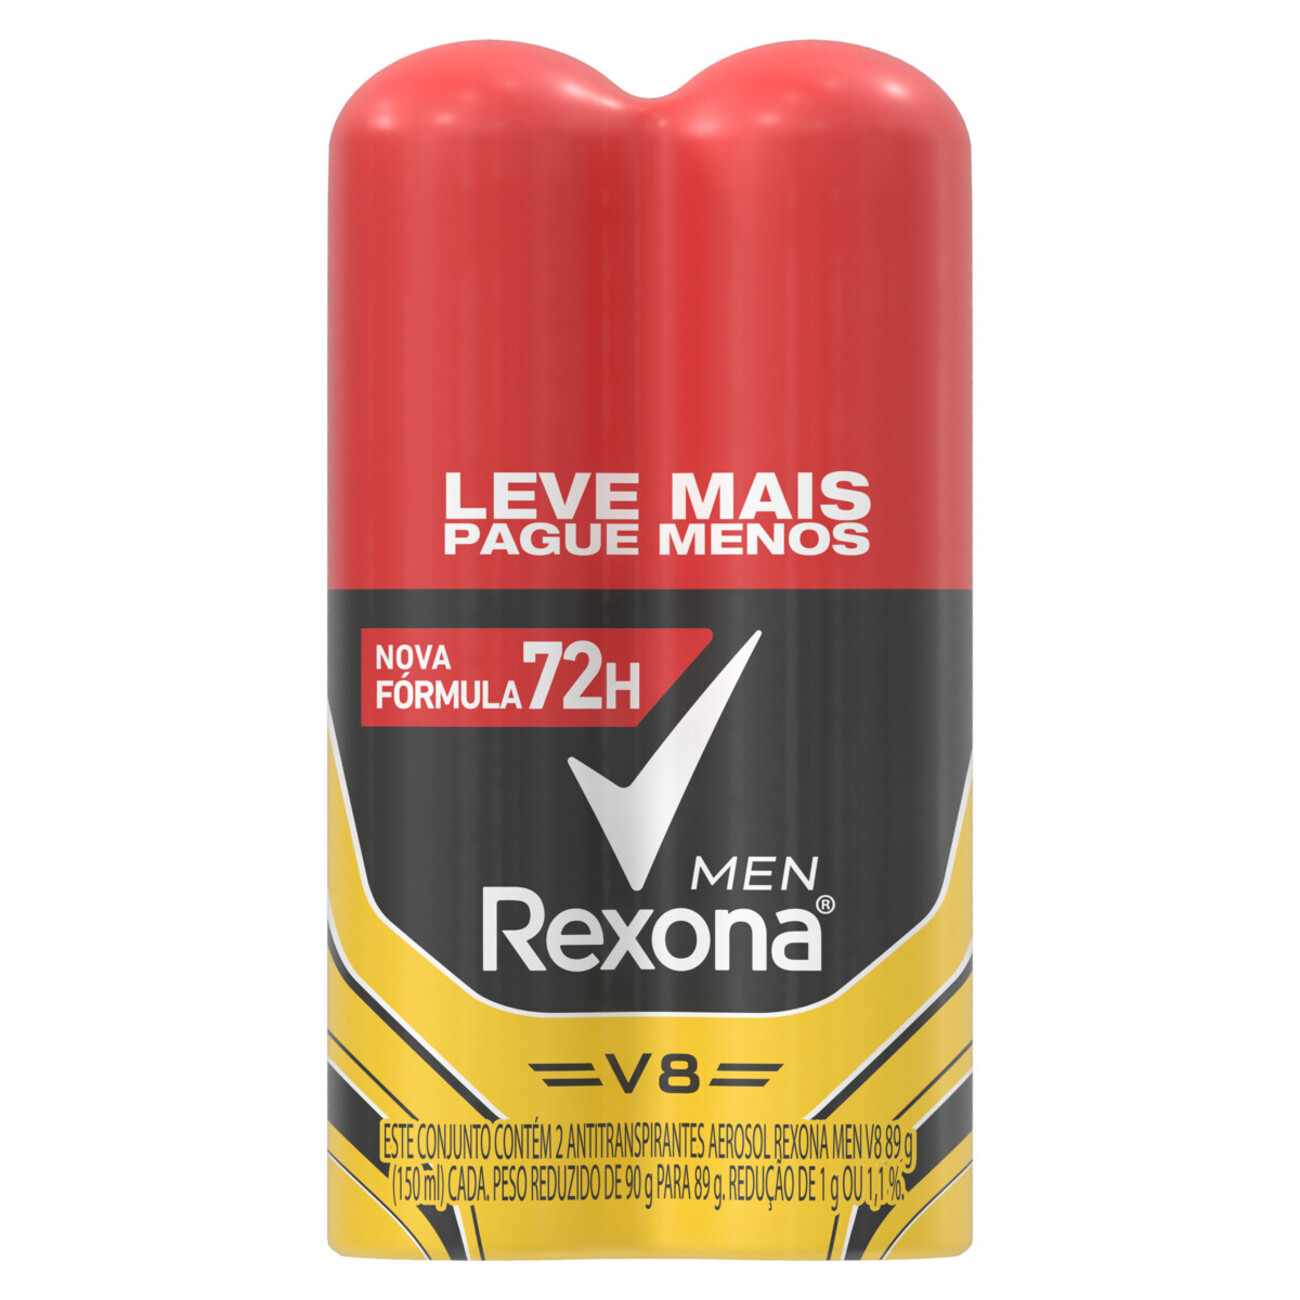 Oferta 2 Desodorantes Antitranspirantes Rexona Men V8 72 horas 150mL